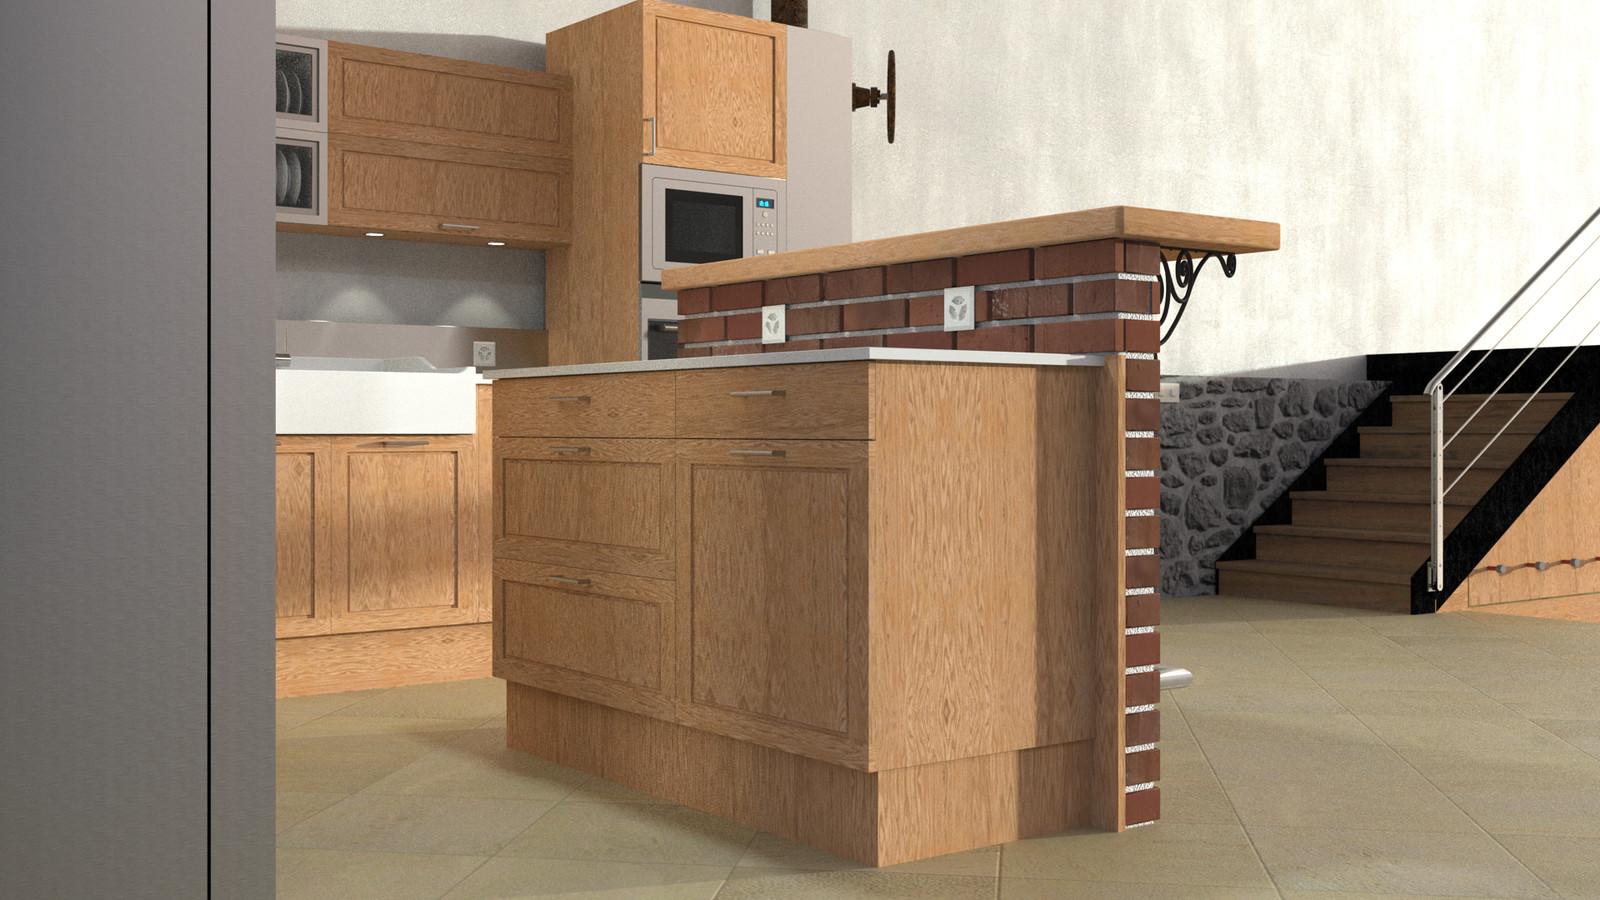 SketchUp + Thea Render  Rivendell Mill's Kitchen Bar Rivendell Brick Bar 2017-Scene 09